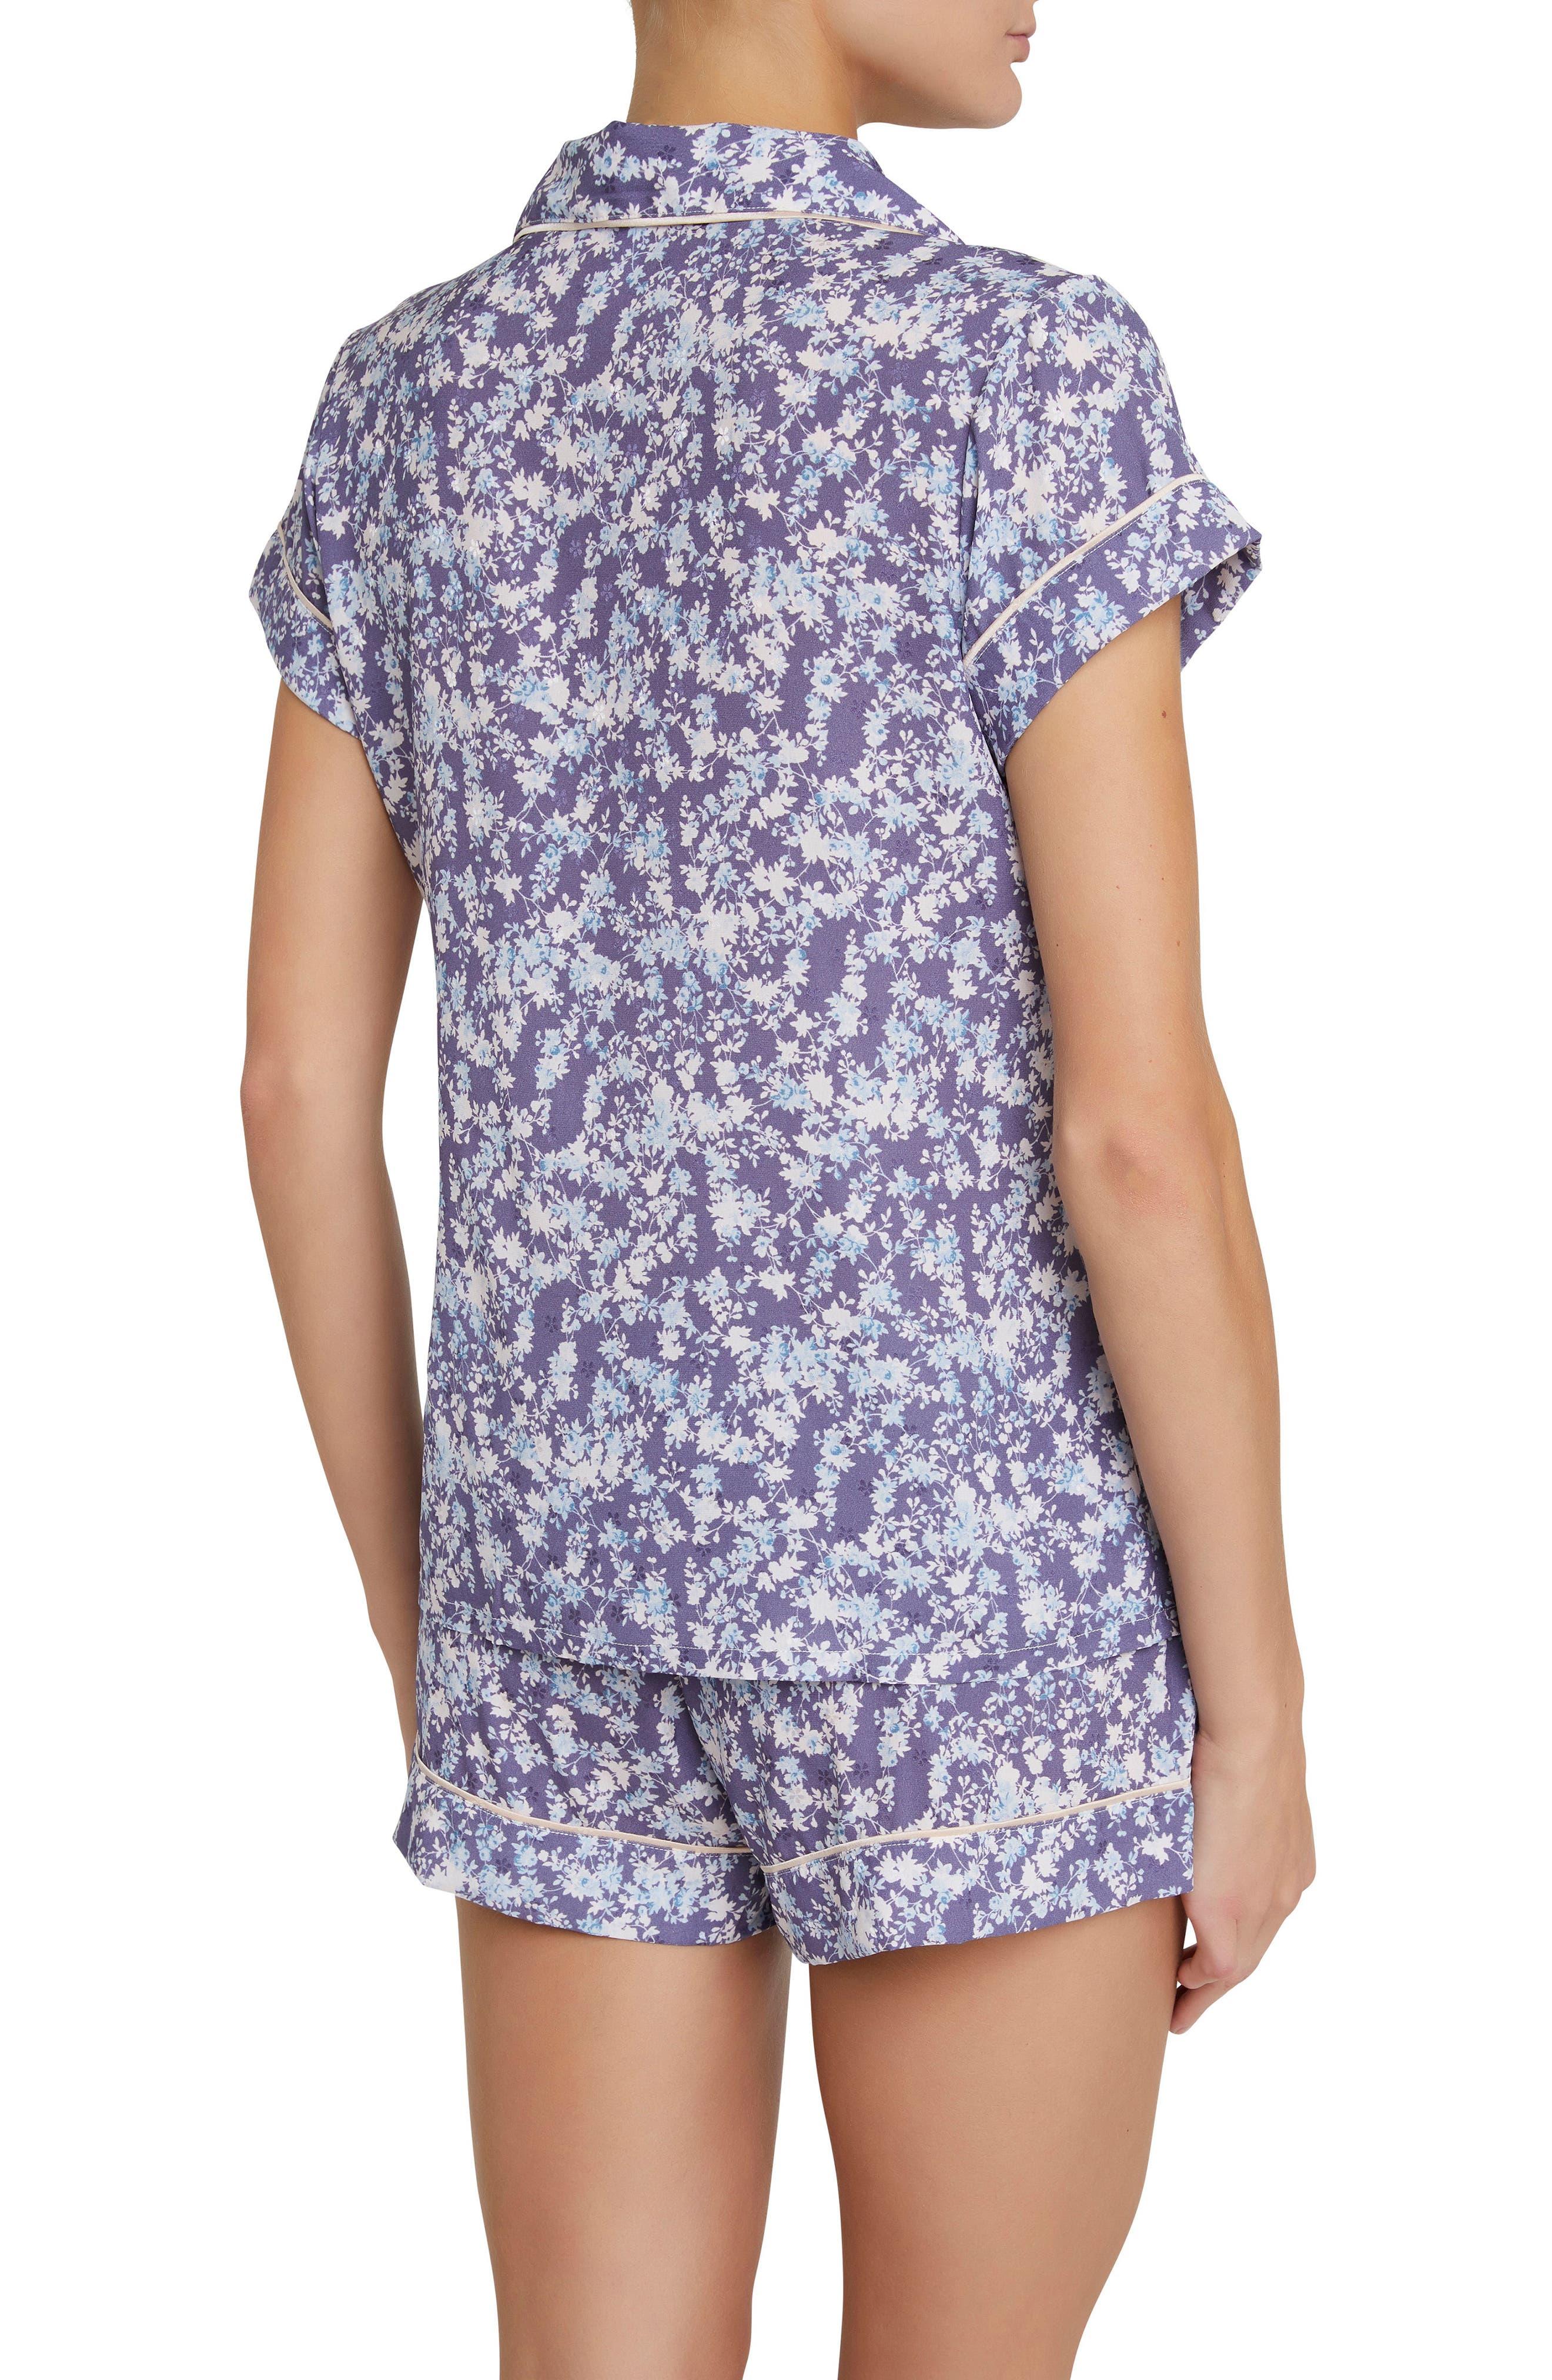 Lily Short Pajamas,                             Alternate thumbnail 2, color,                             Blue Floral Print